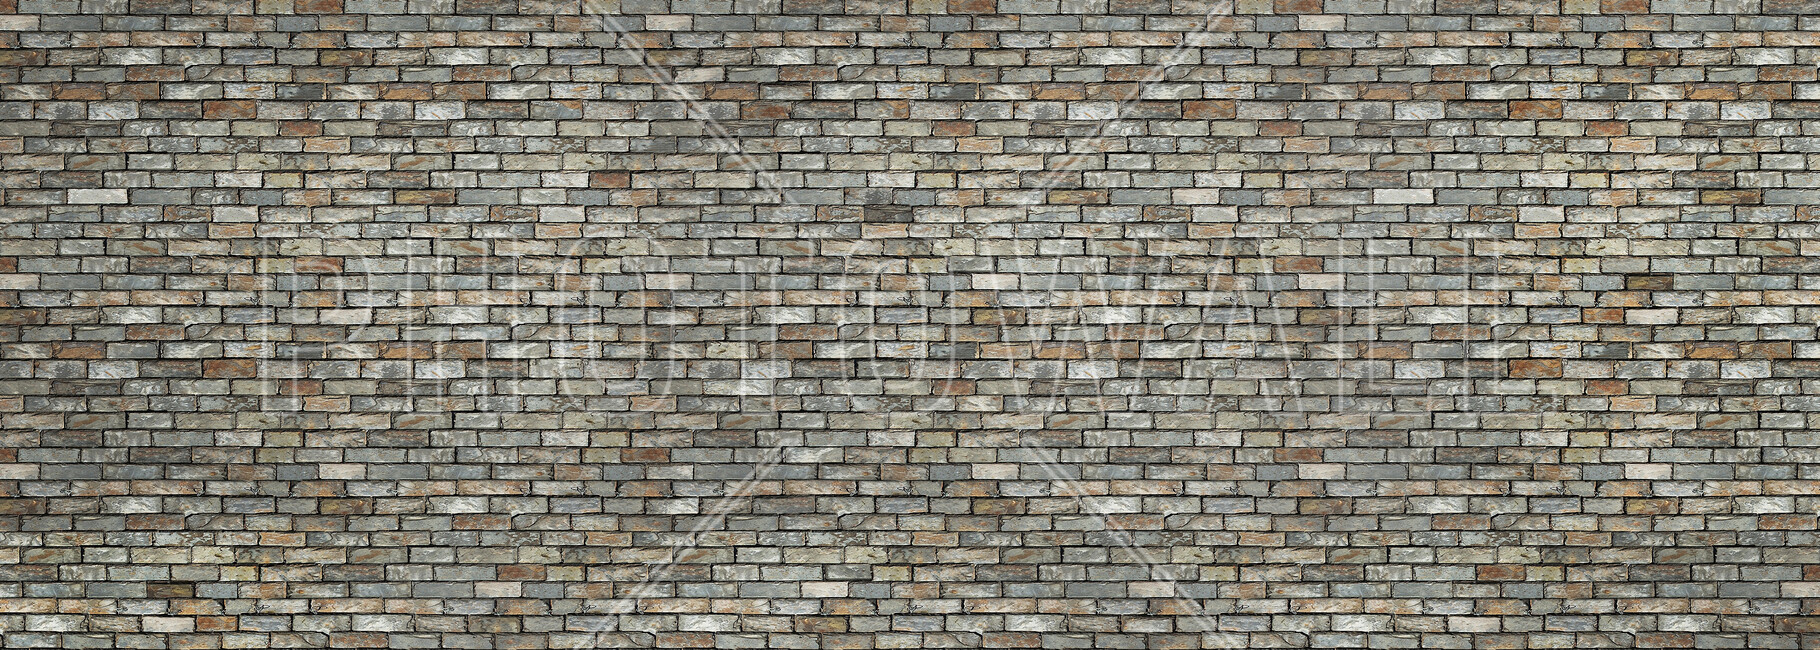 Stone wall wall mural photo wallpaper photowall stone wall amipublicfo Images